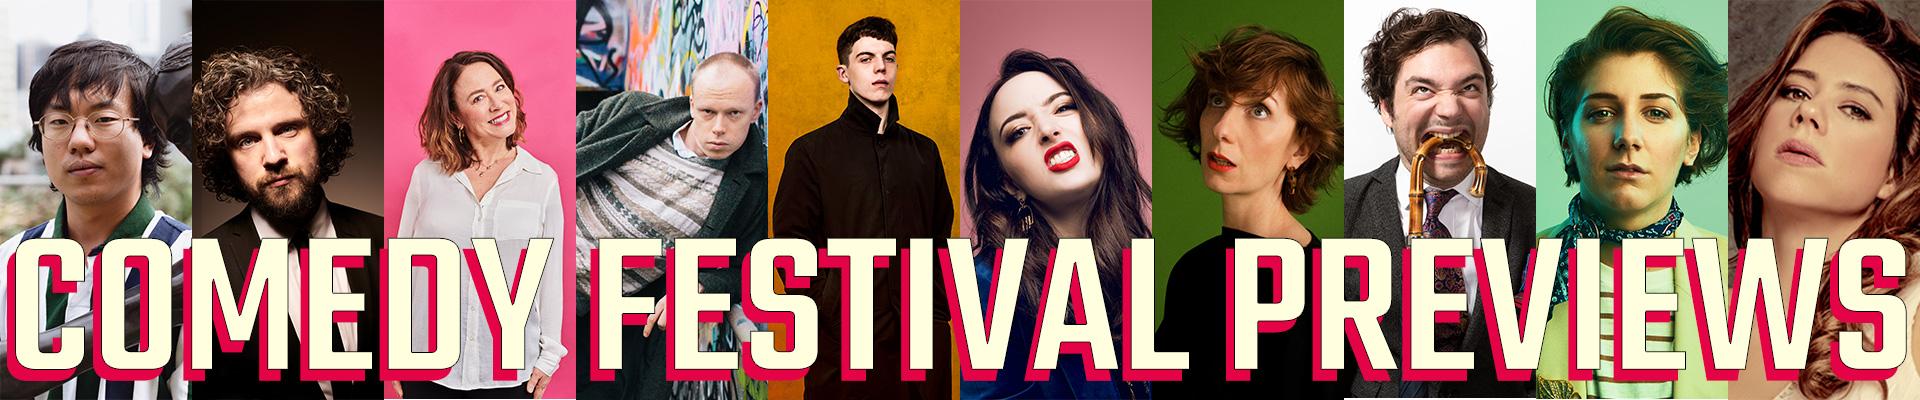 Comedy Festival Previews